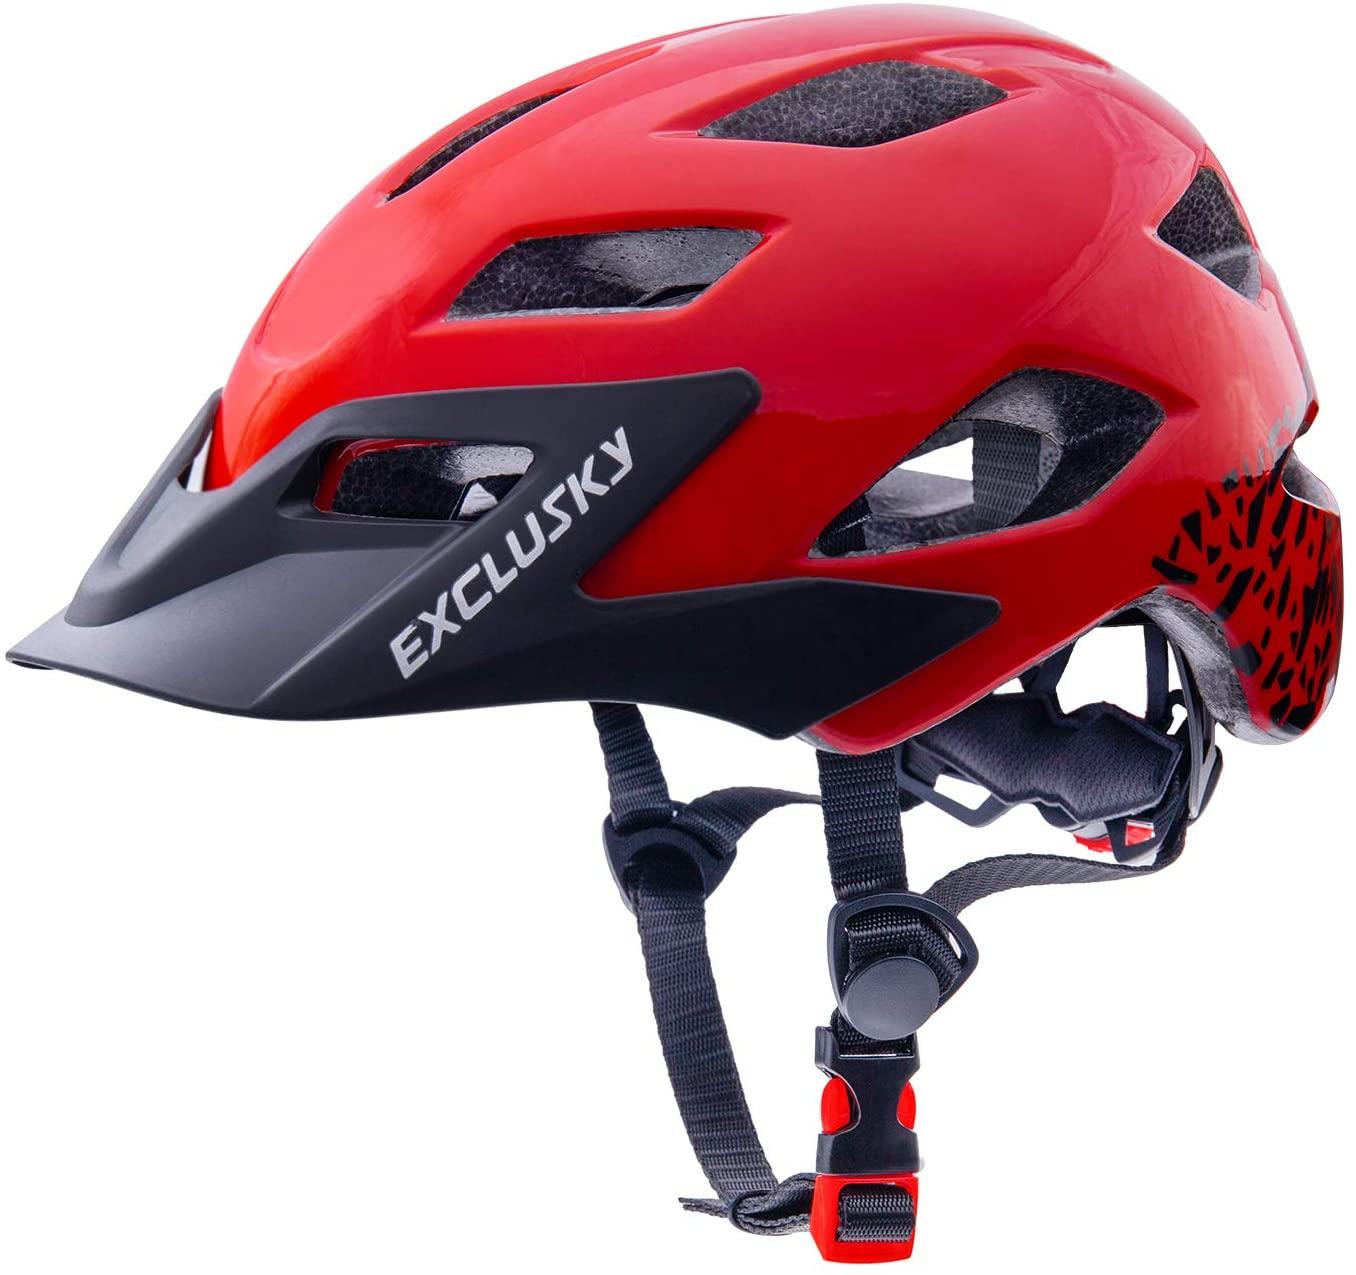 casco bicicleta exclusky